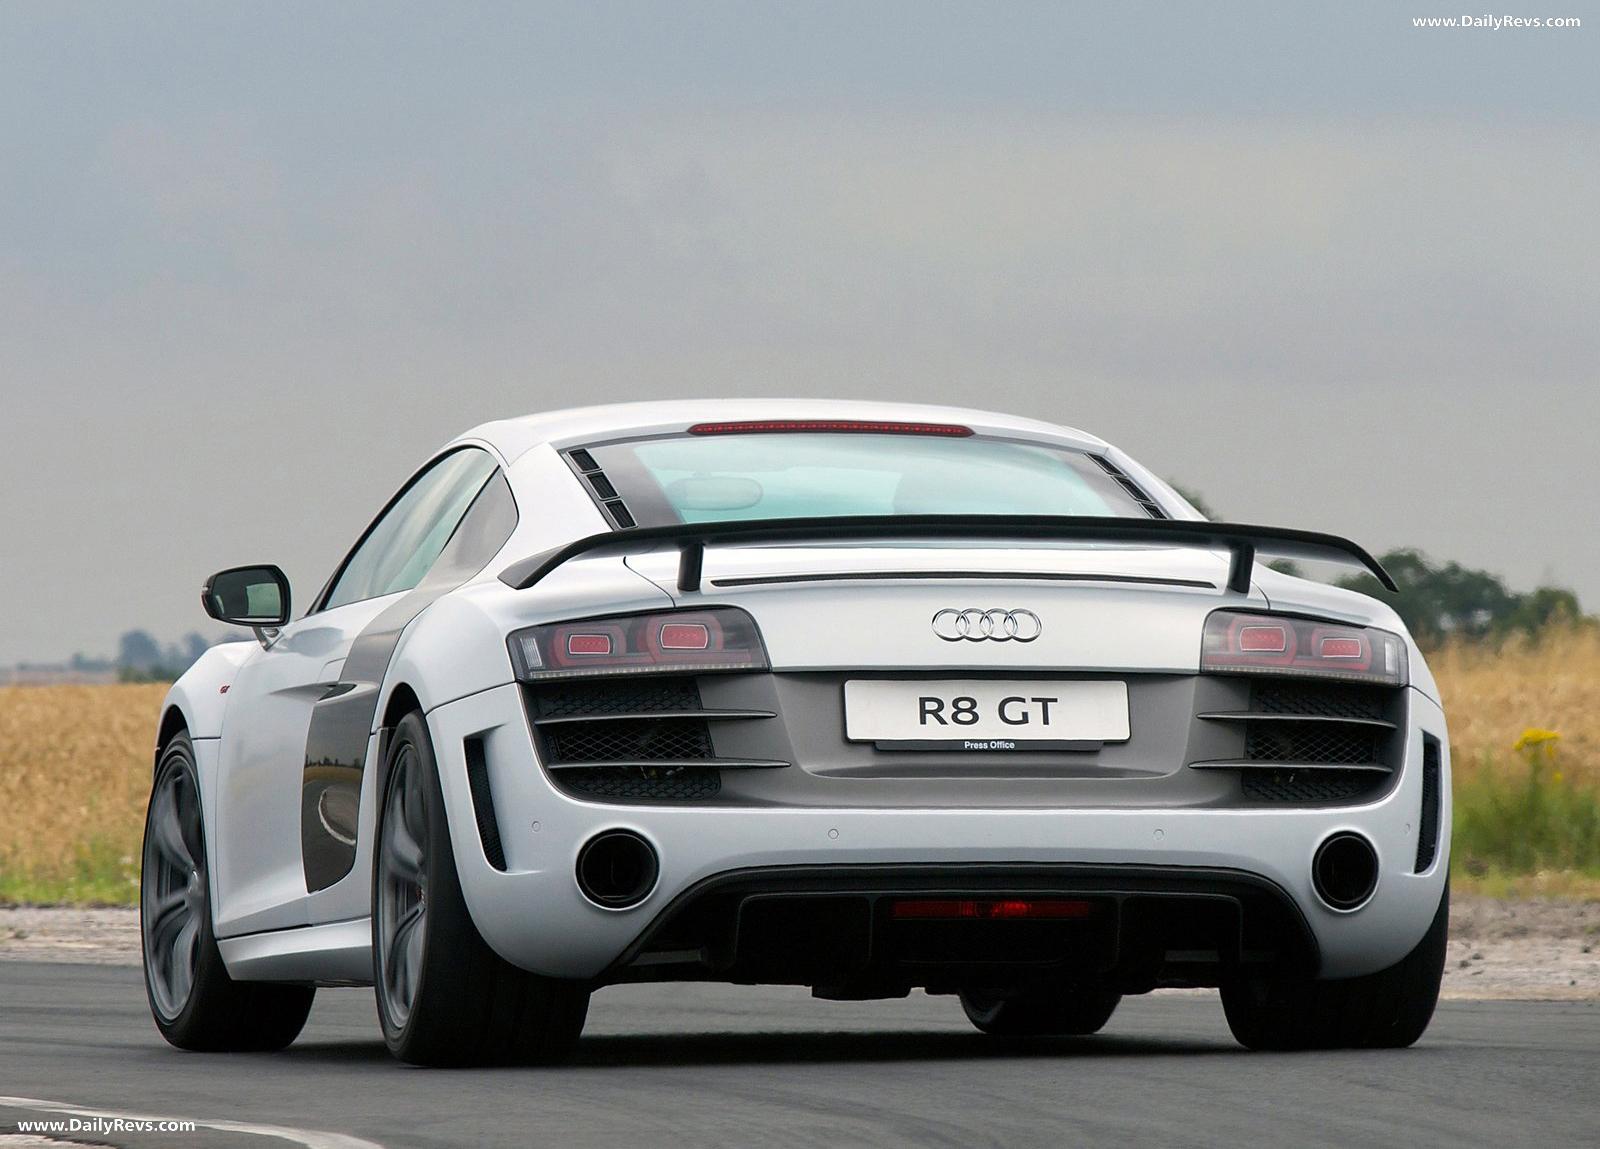 2011 Audi R8 GT - HD Pictures, Videos, Specs ...